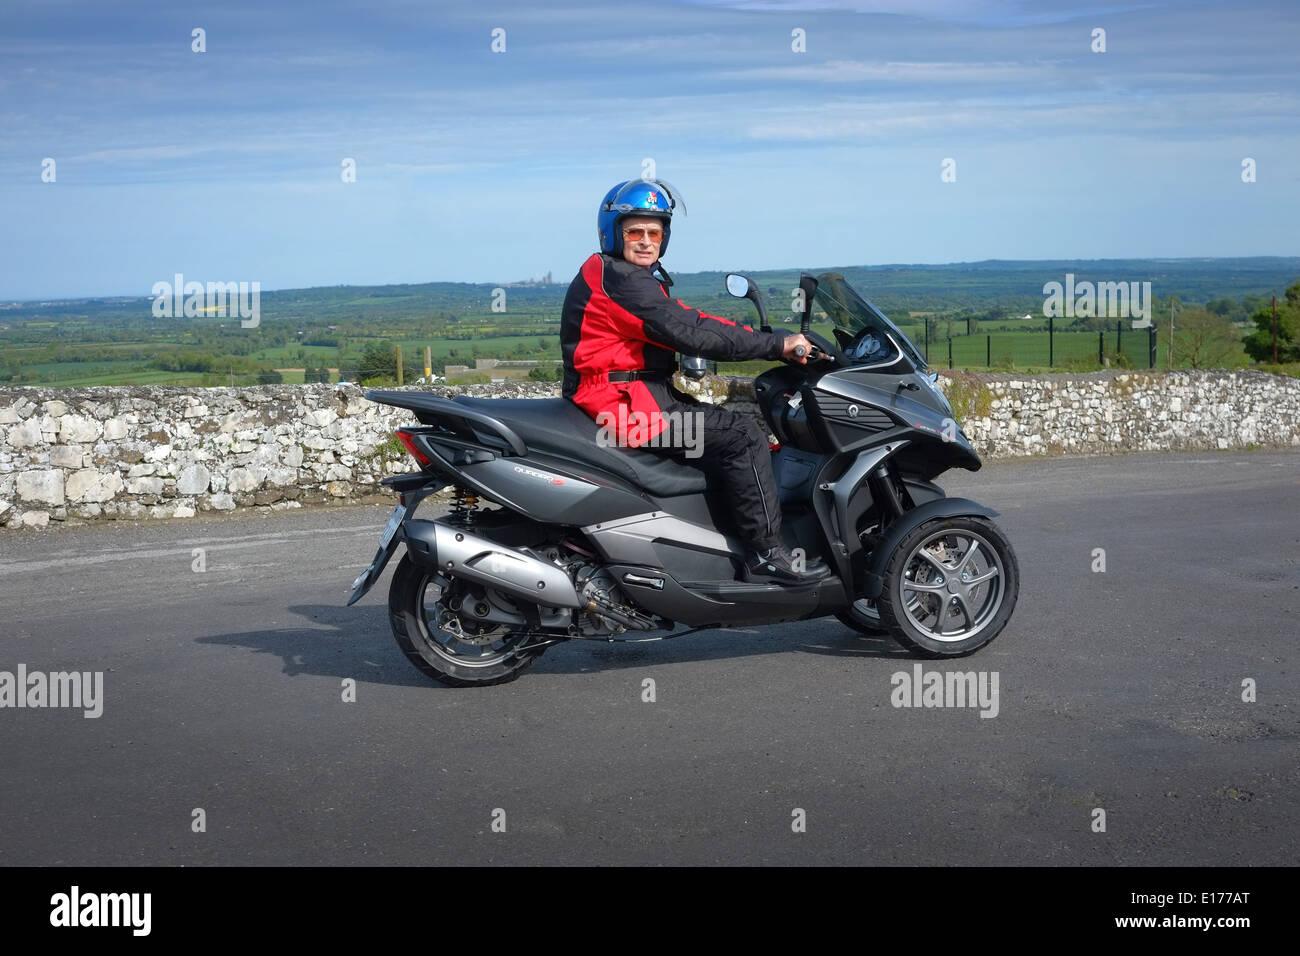 three wheeled Motor scooter, Man on a Quadro 350s tilting three